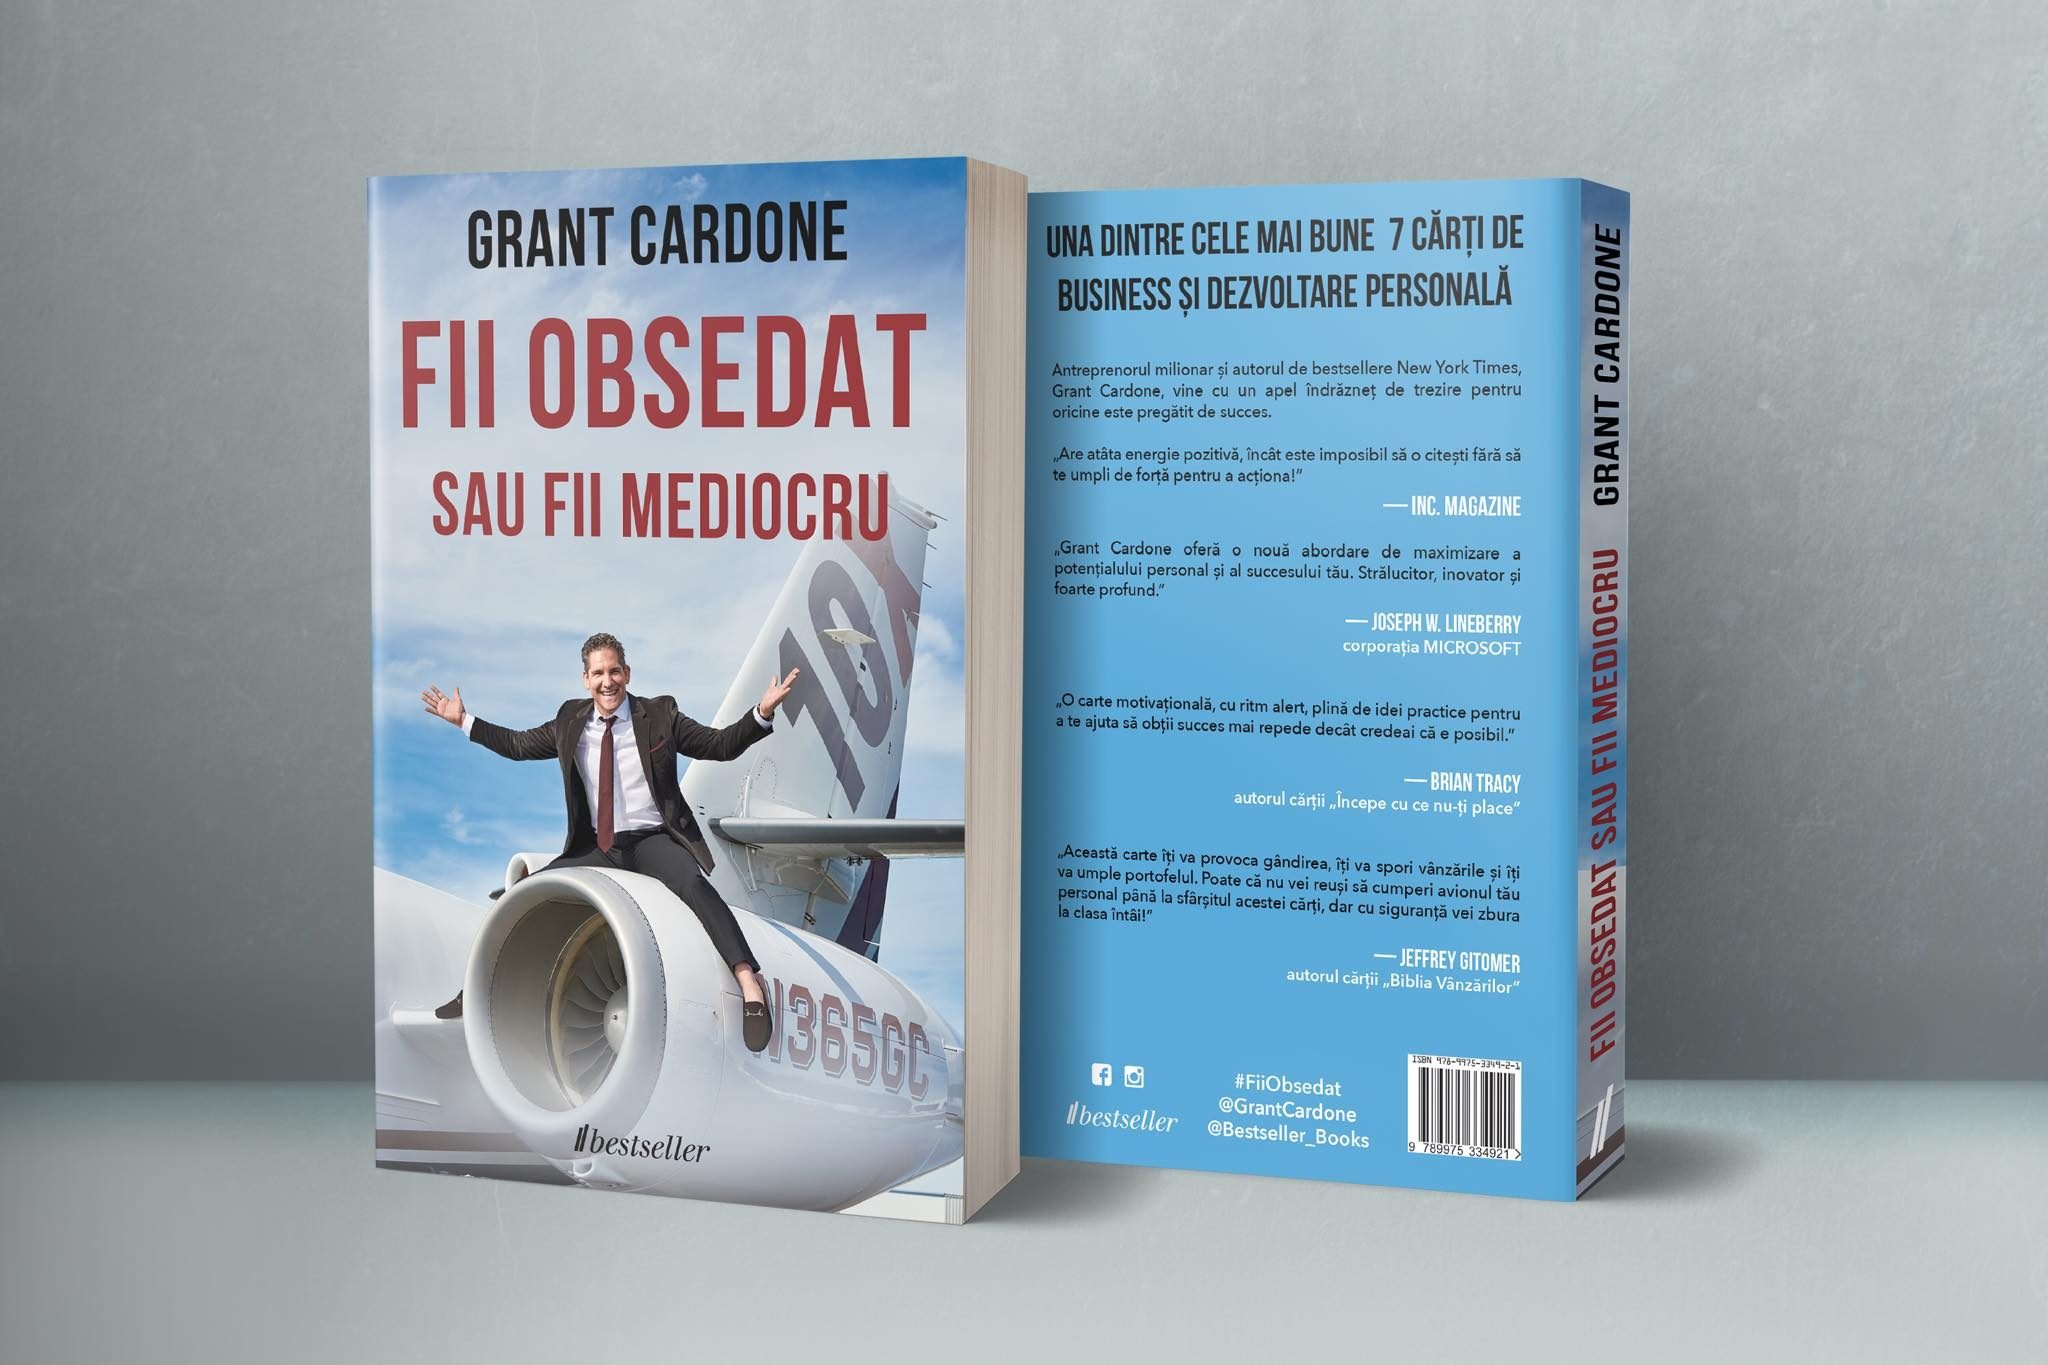 Fii Obsedat sau Fii Mediocru Grant Cardone Editura Bestseller 1